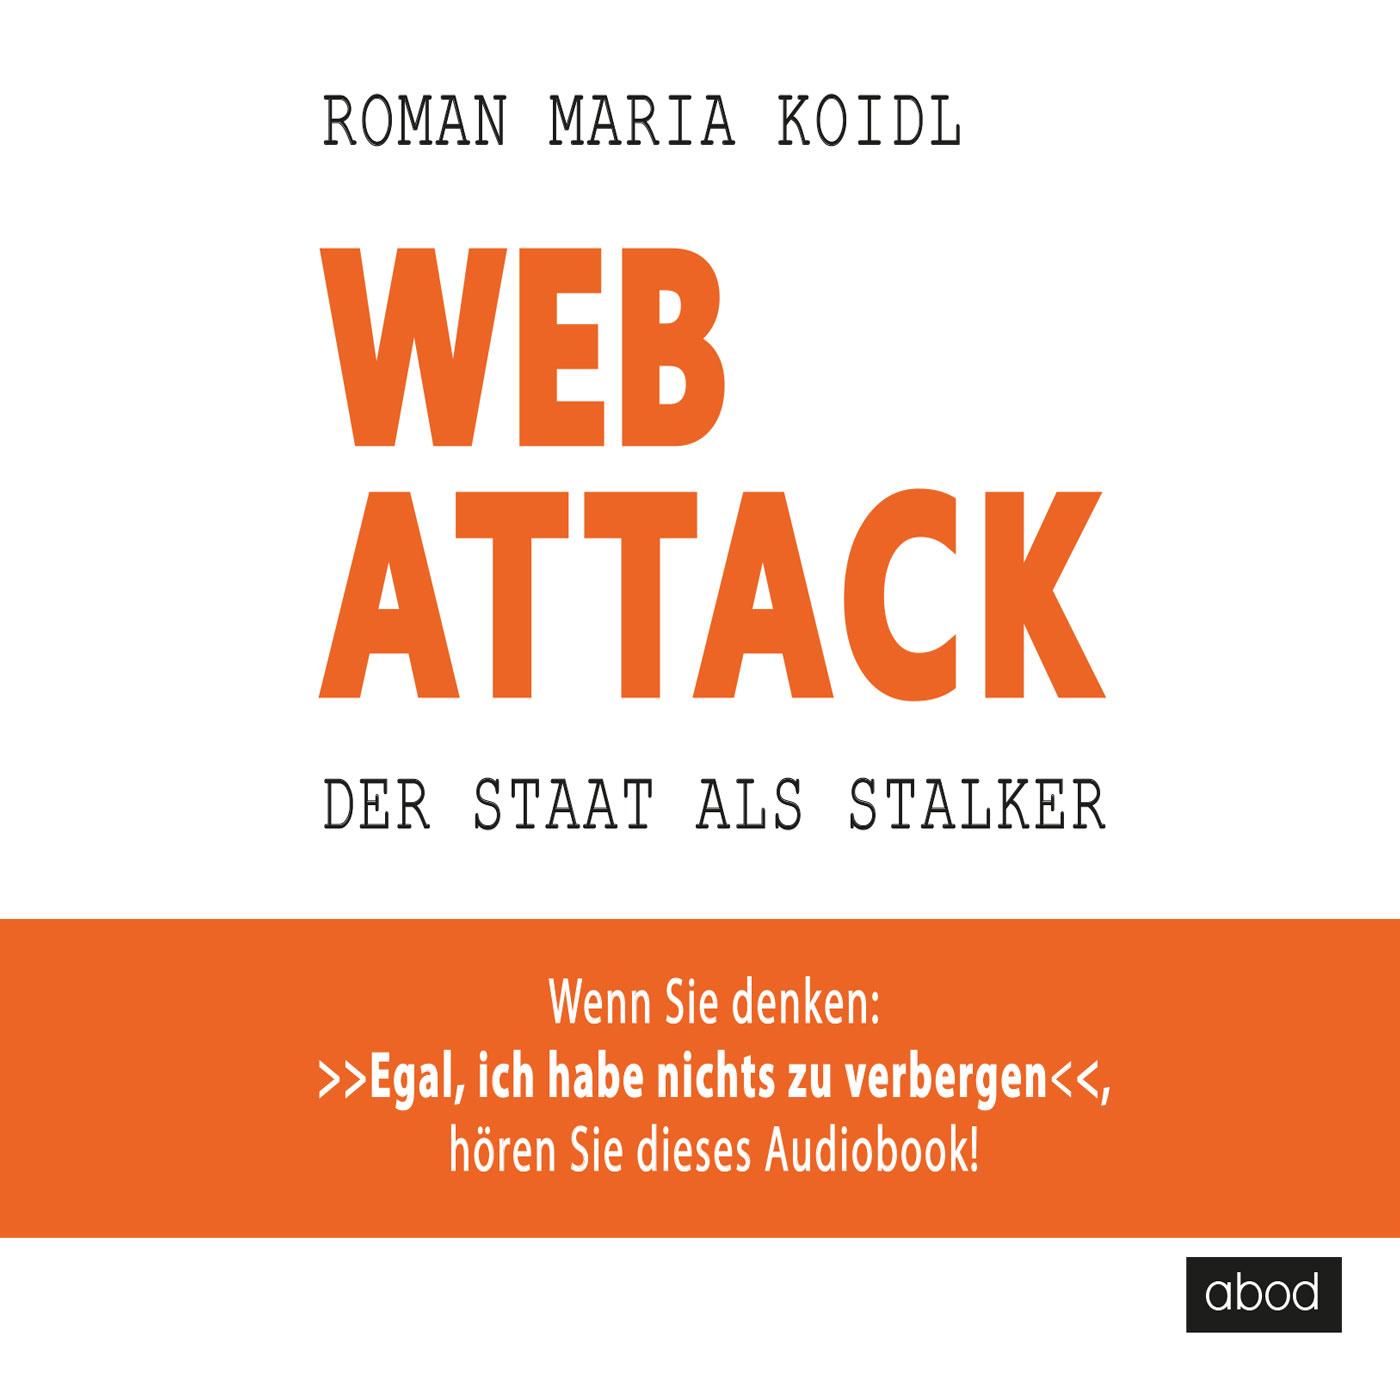 WebAttack, Roman Maria Koidl